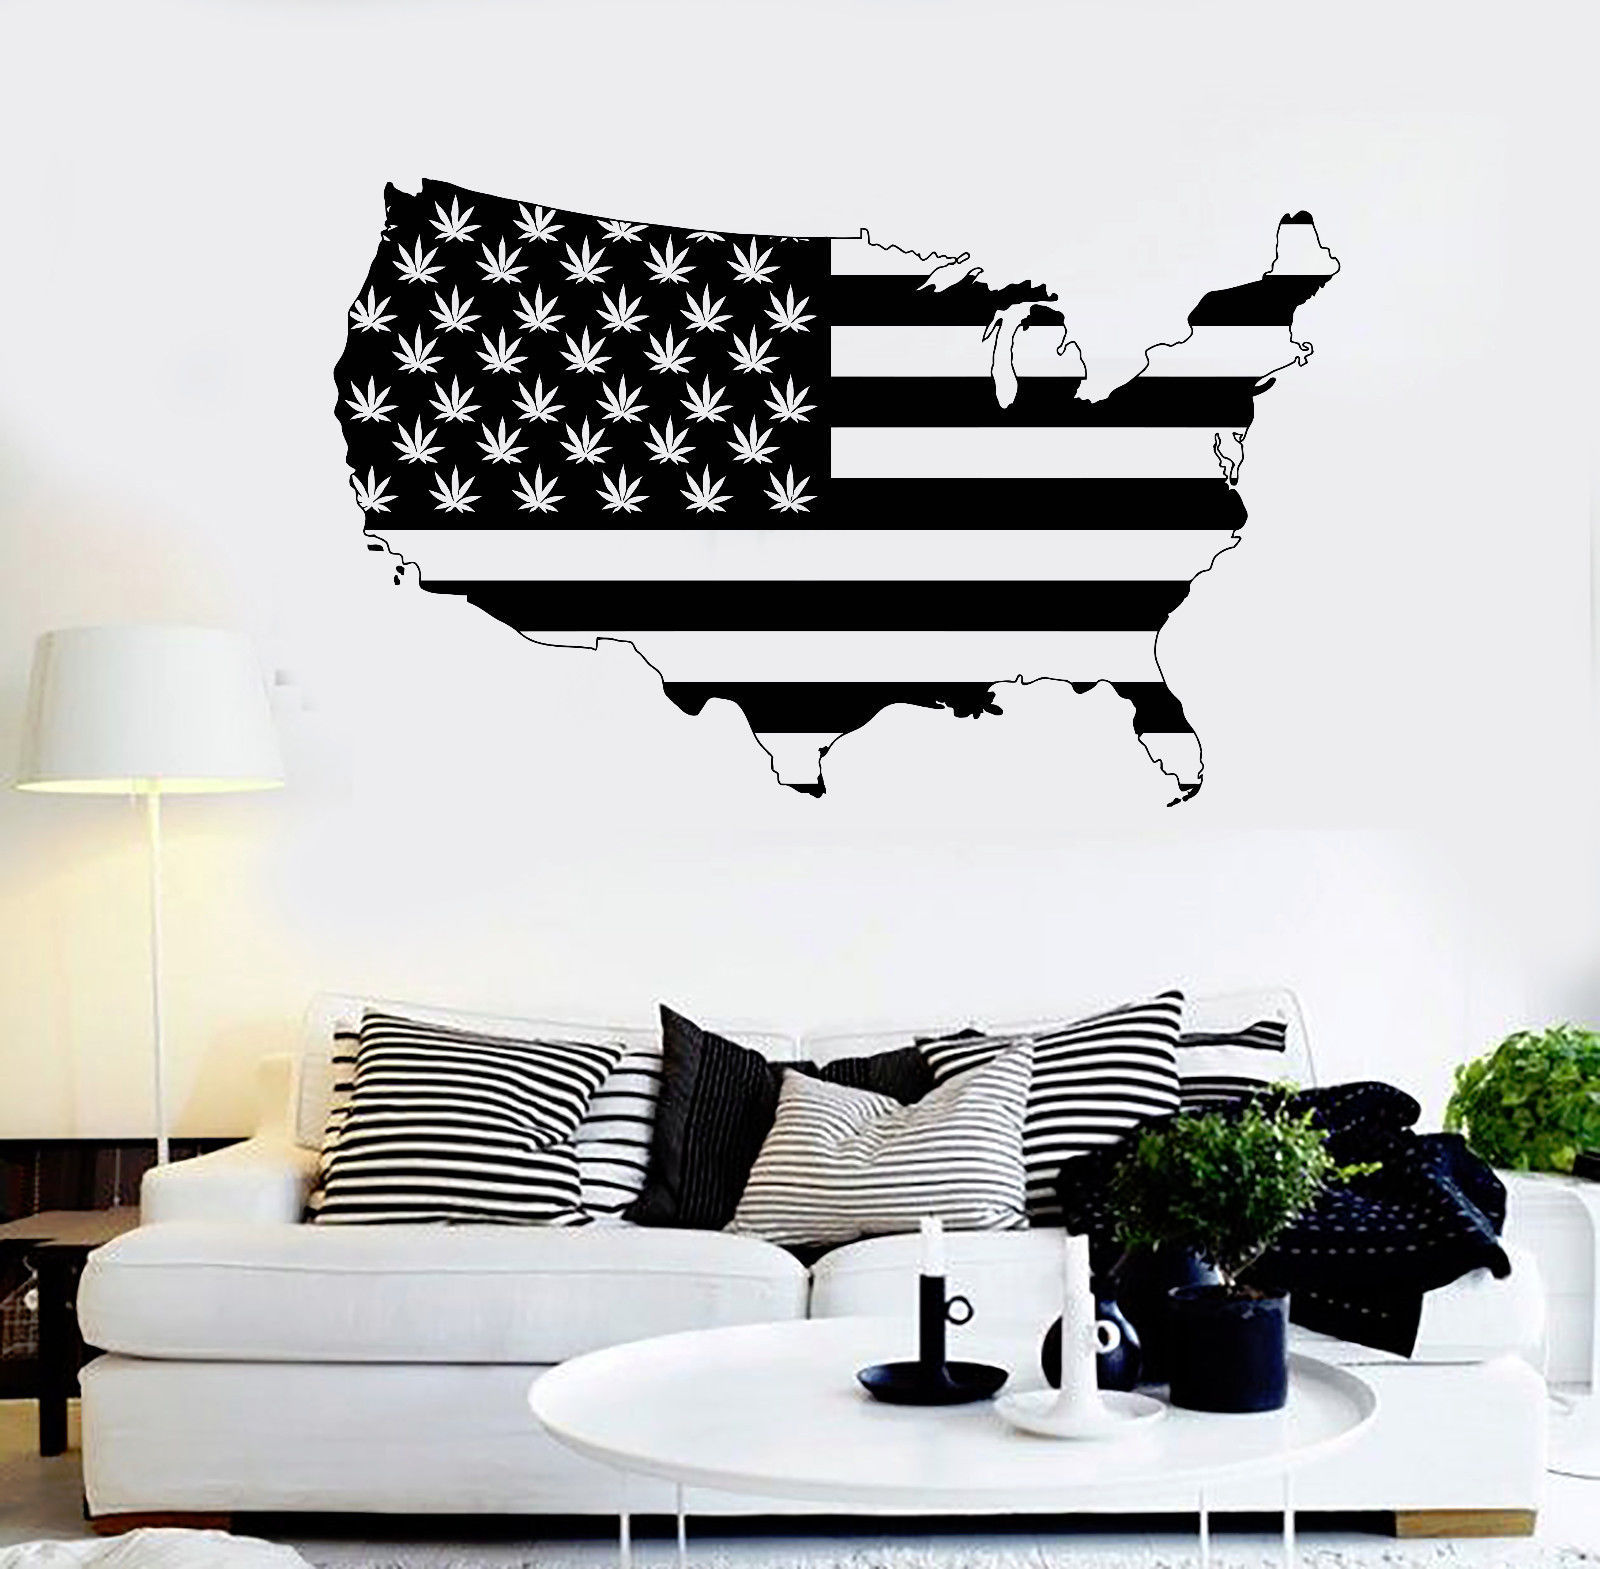 Vinyl Wall Decal United States Map Marijuana Smoking Weed